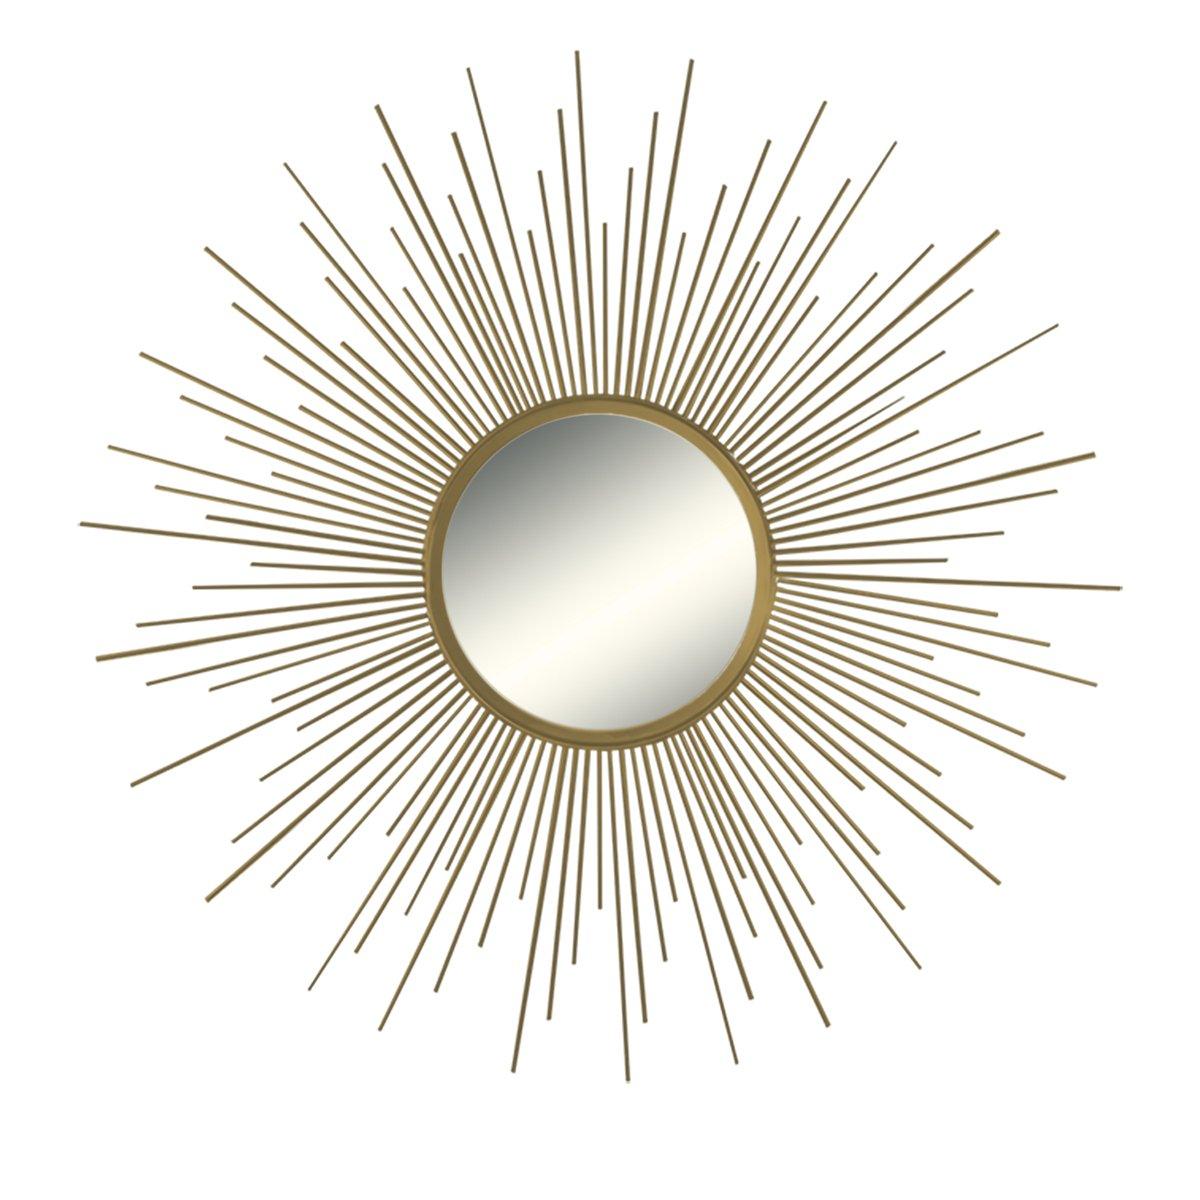 "36"" Decorative Wall Hanging Mirror in Sunburst Shape, Brushed Gold Sunburst Round Wall Mirror, Mid Century Modern Style Mirror, Brushed Gold Finish"